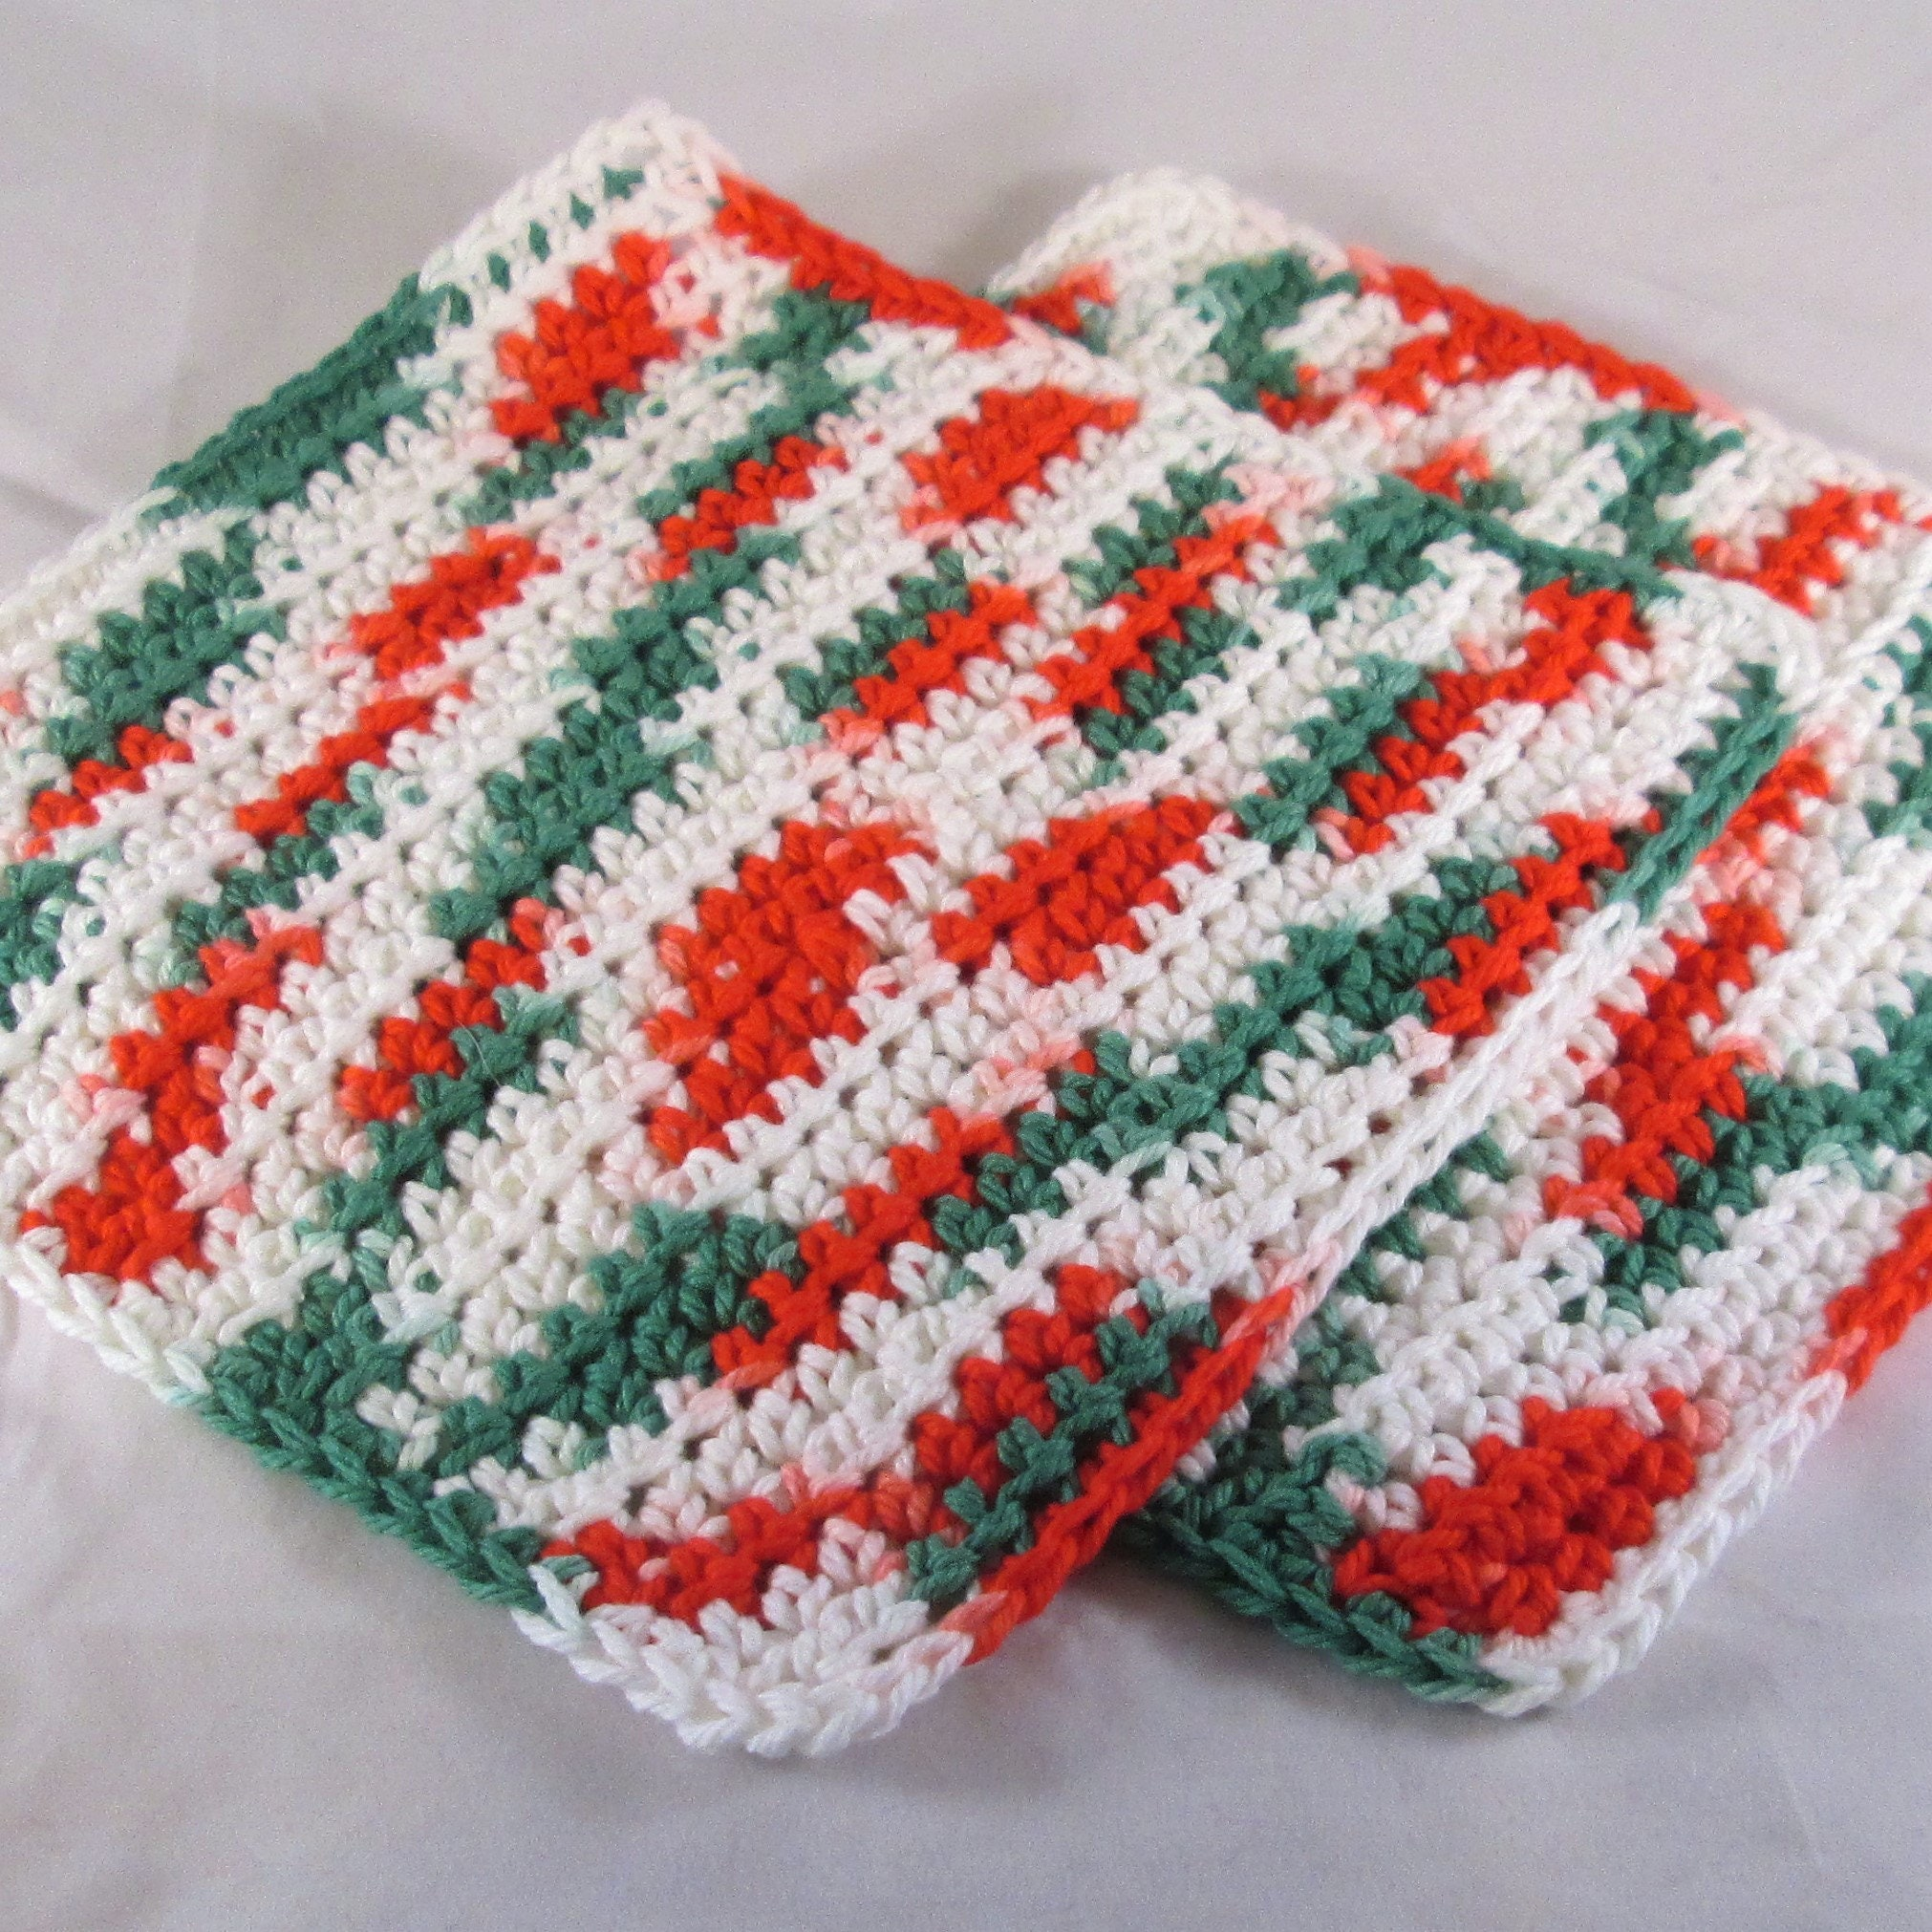 Christmas Cotton Washcloth, Red and Green Crochet Washcloth, Holiday ...